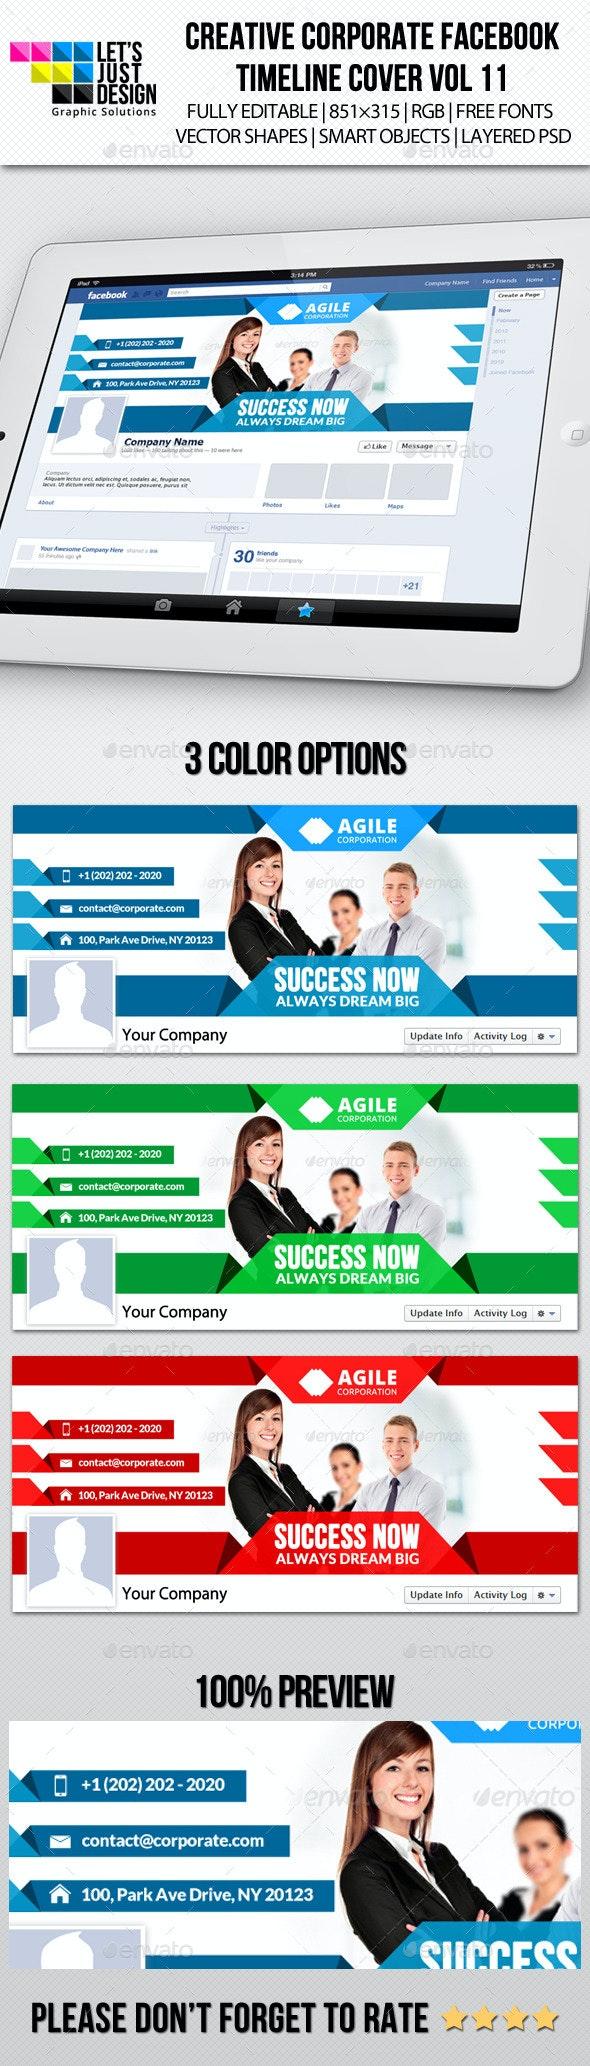 Creative Corporate Facebook Timeline Cover Vol 11 - Facebook Timeline Covers Social Media